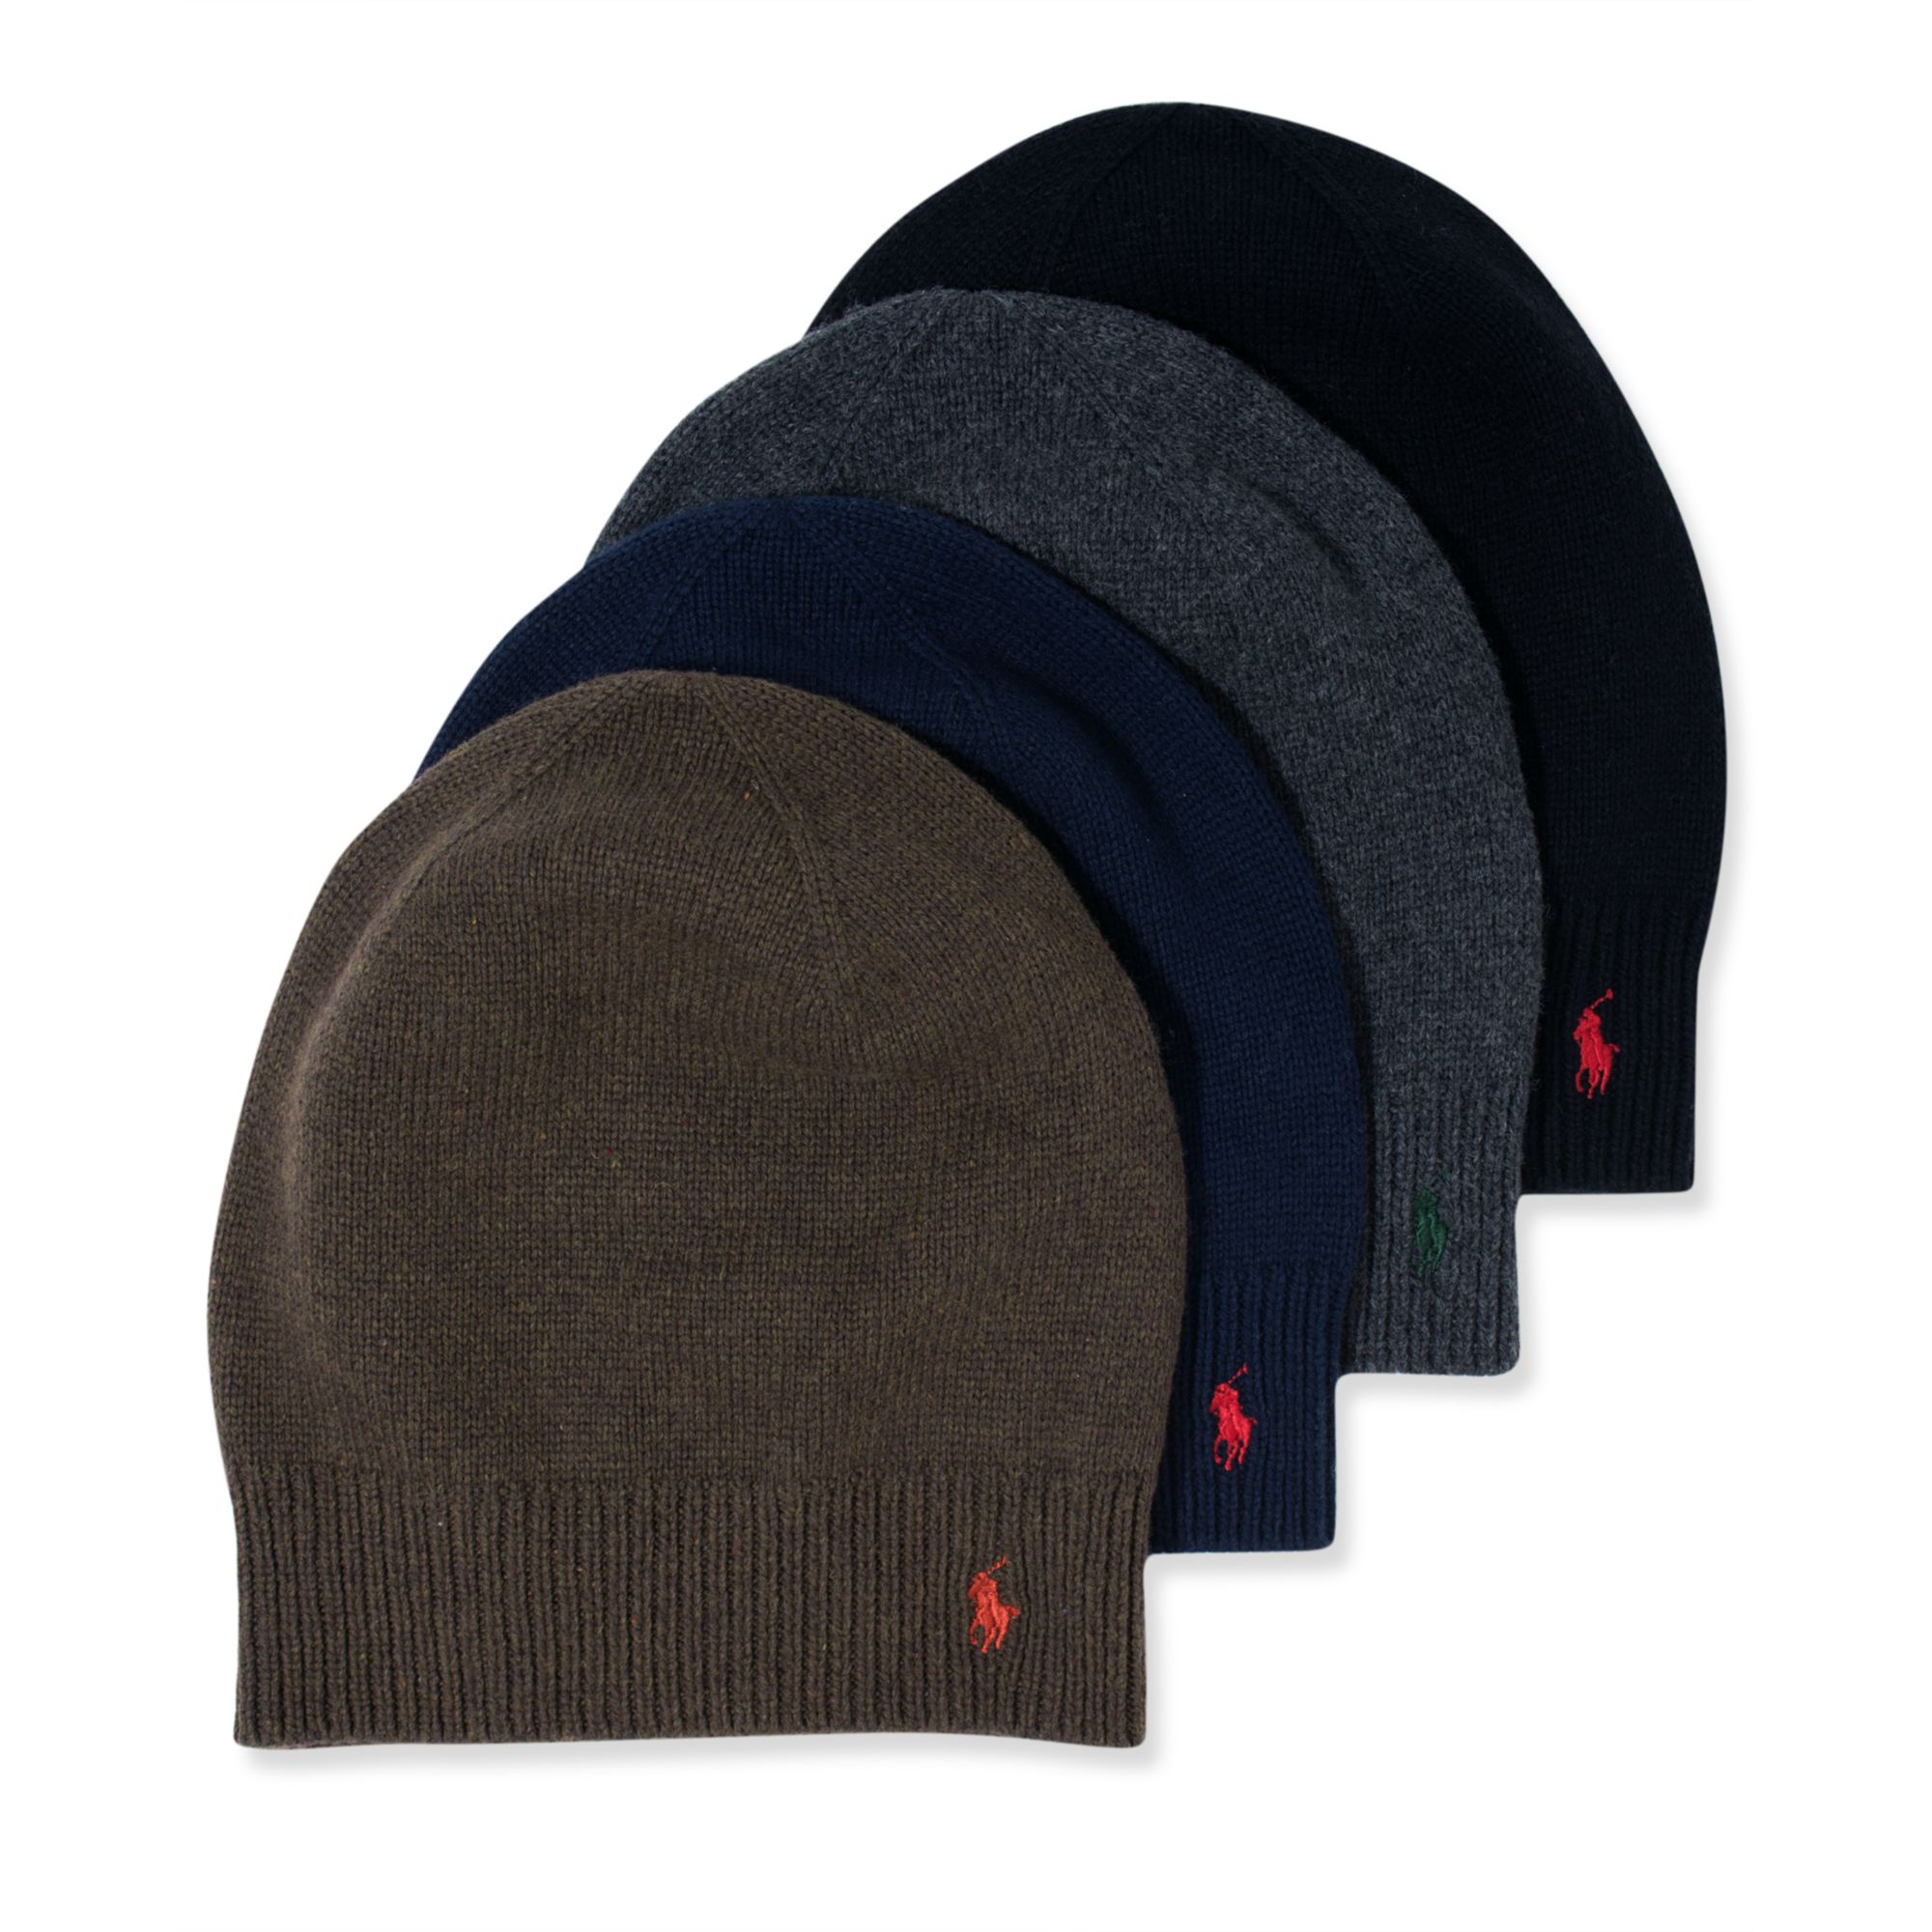 ralph lauren slouchy skull cap in black for men lyst. Black Bedroom Furniture Sets. Home Design Ideas